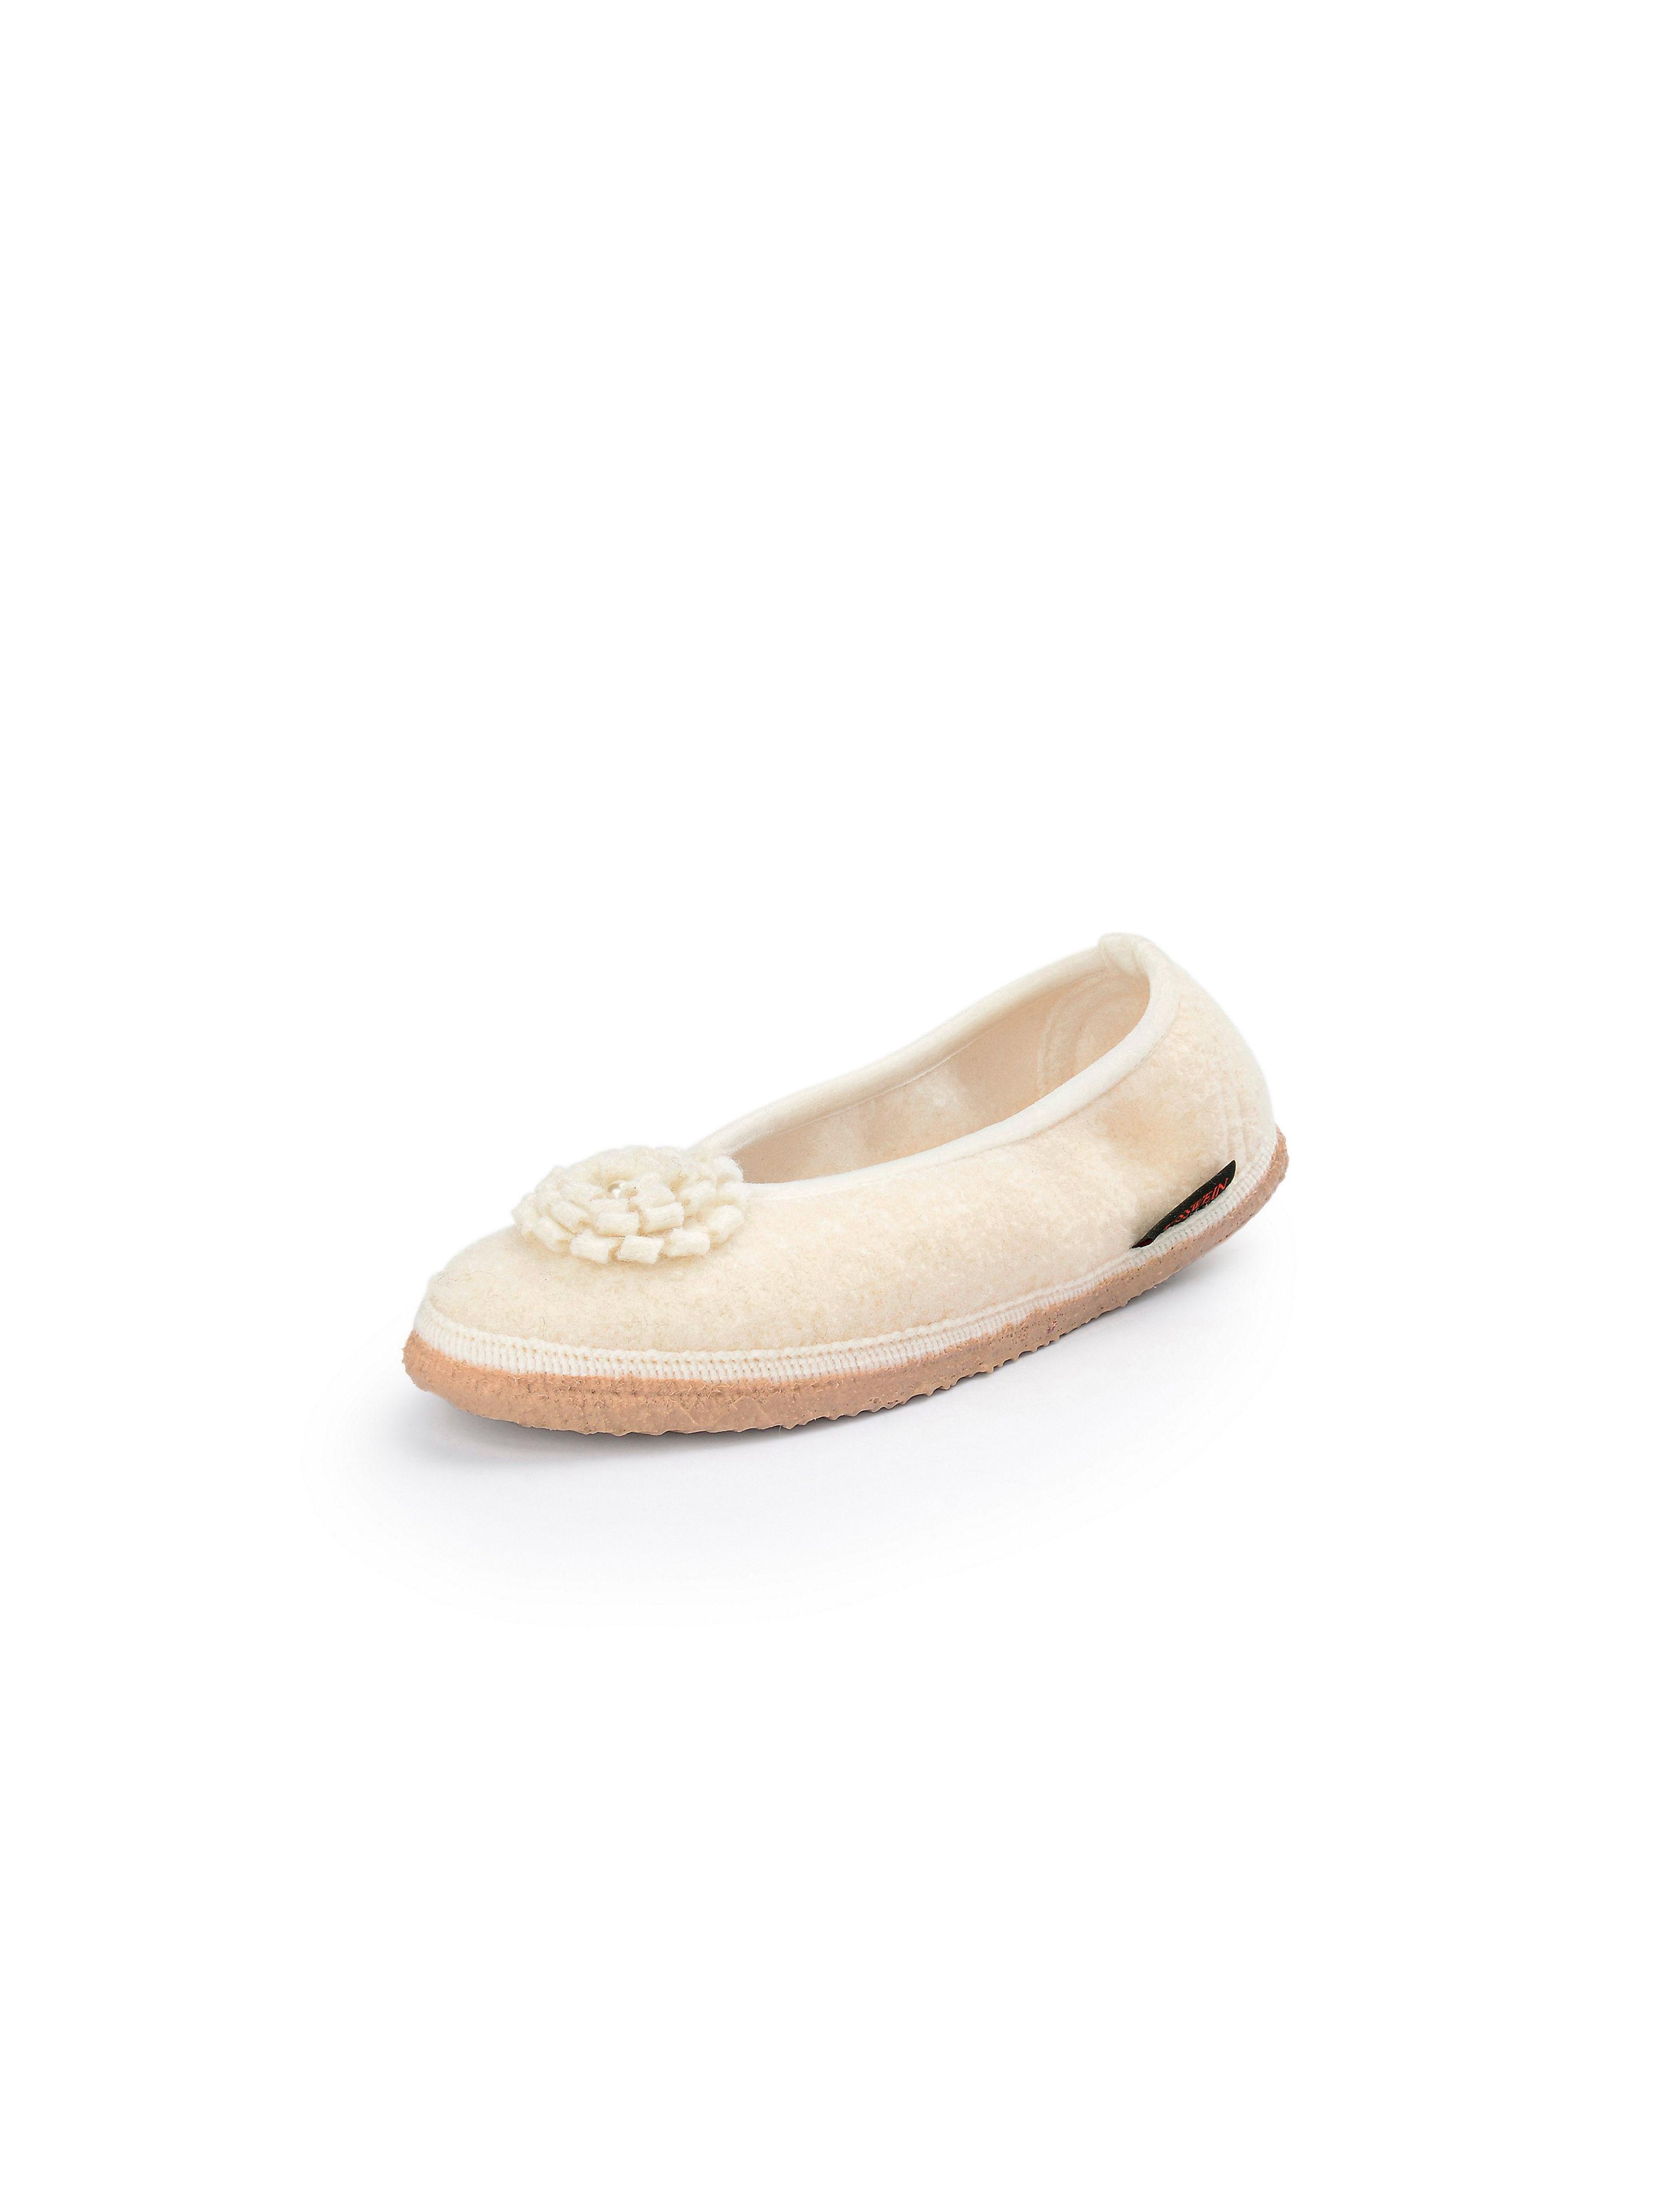 Image of   Ballerina Fra Giesswein beige